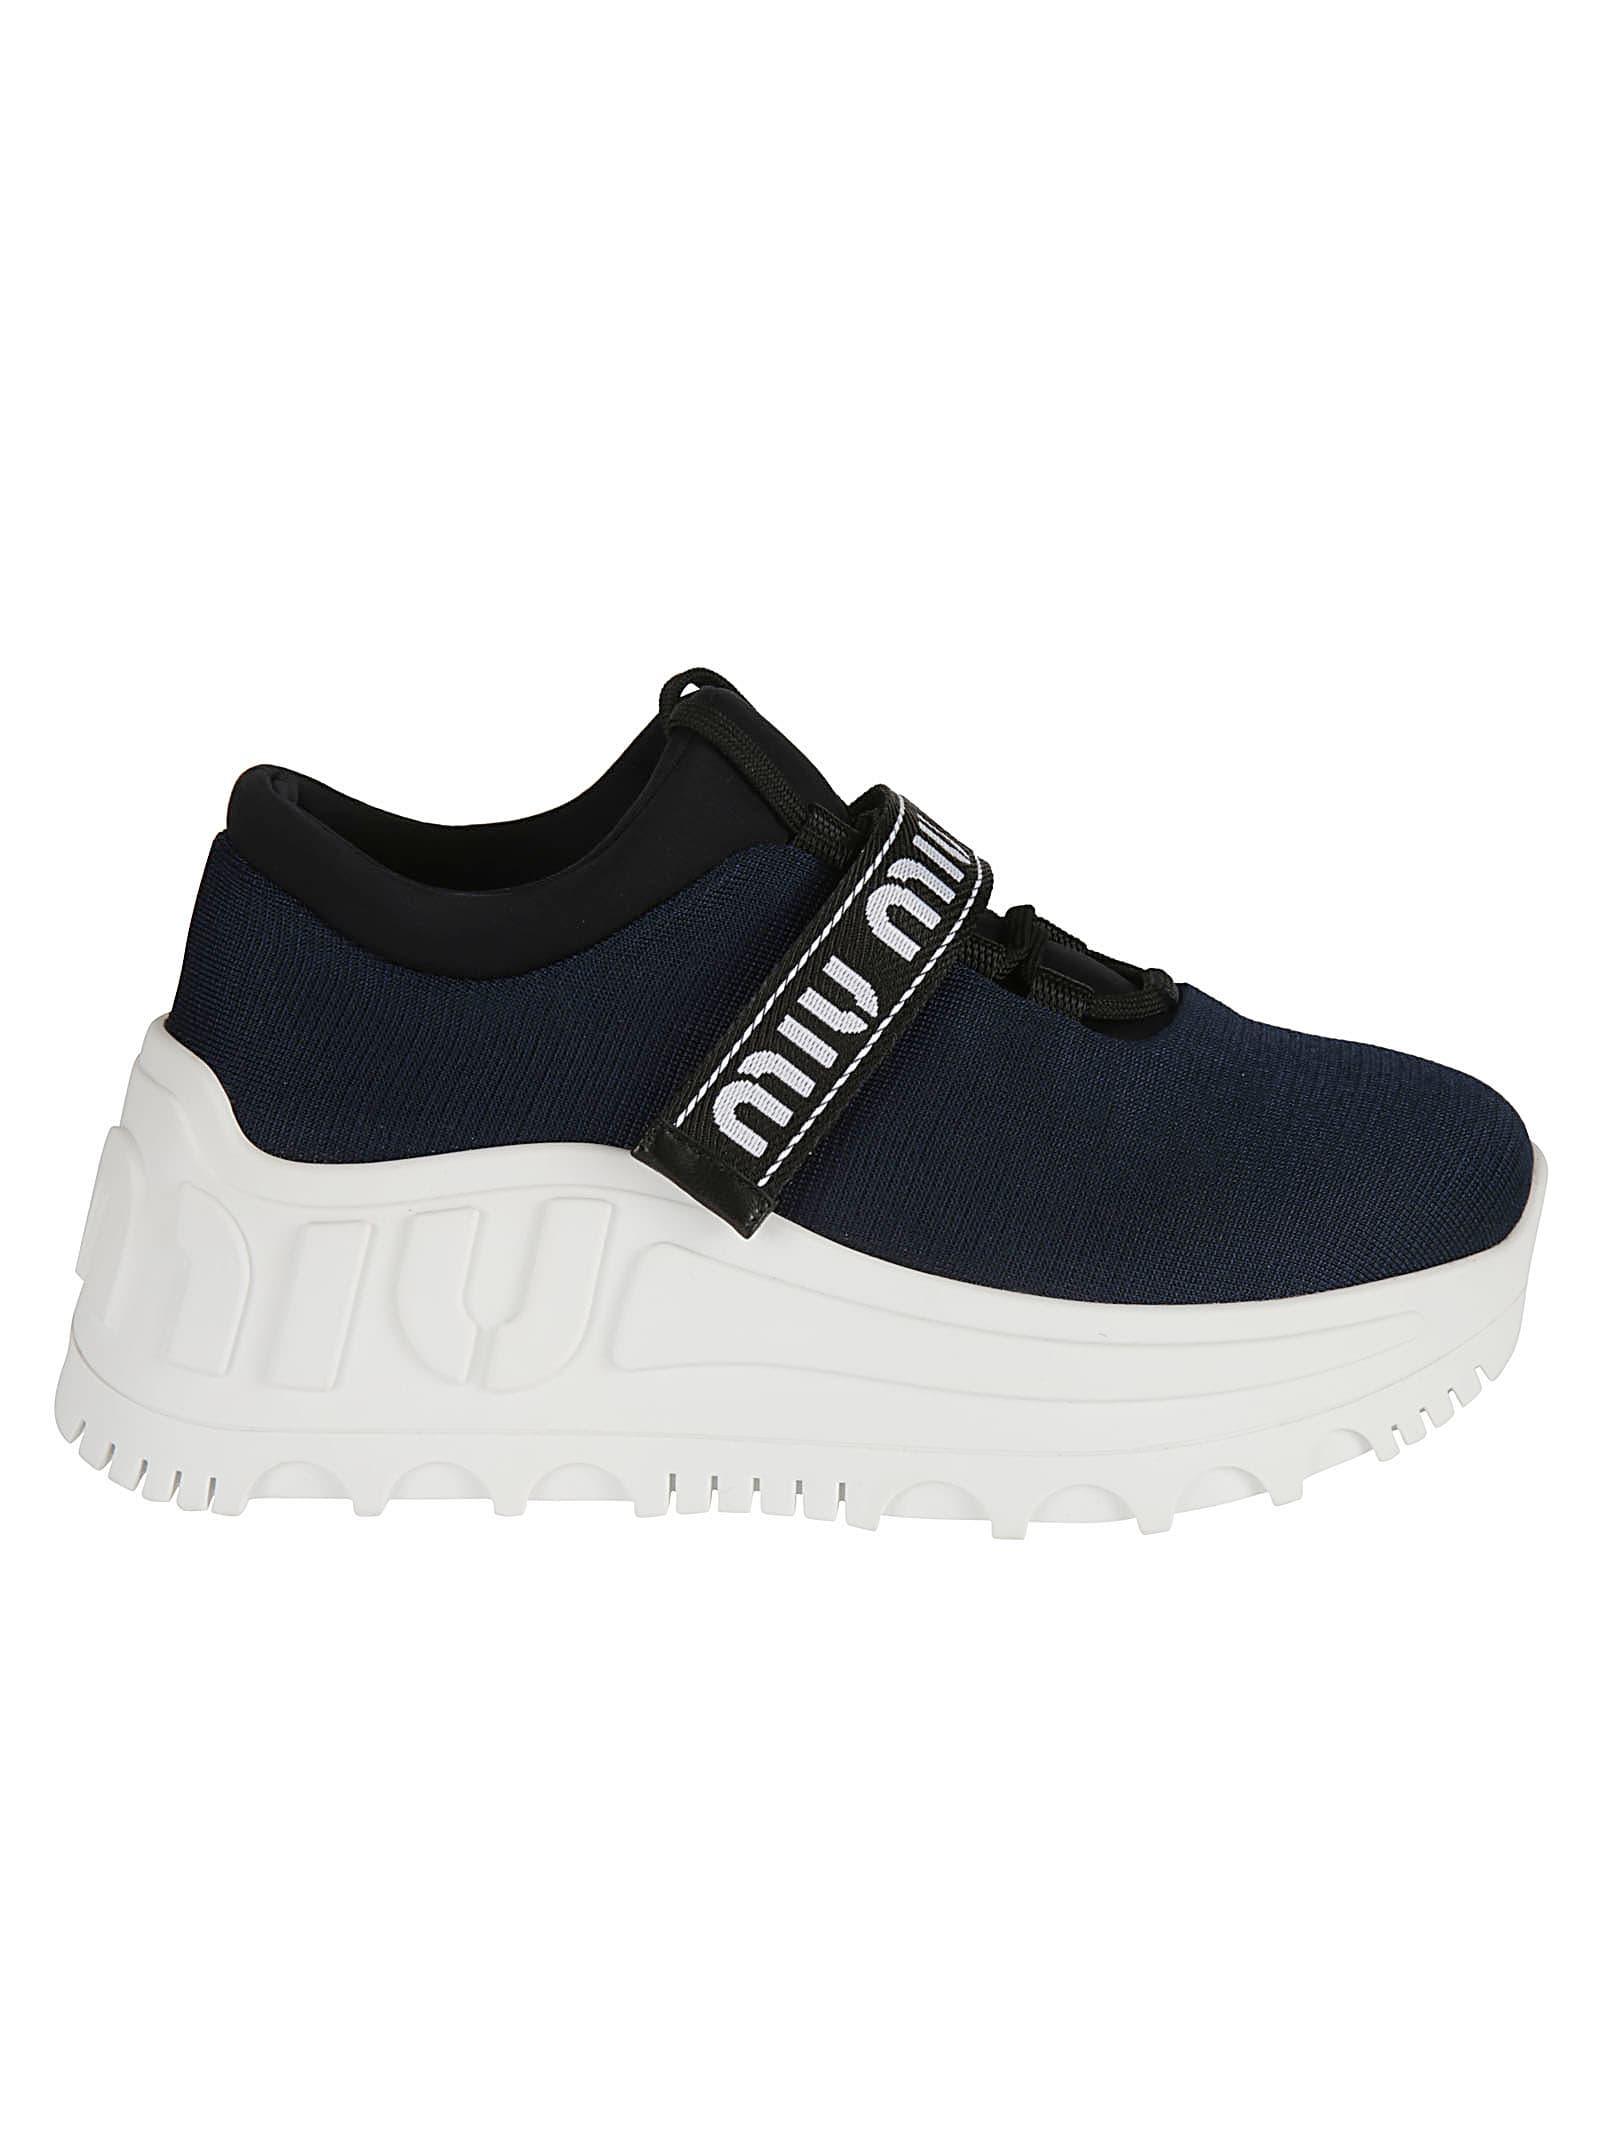 meet cb252 7da89 Miu Miu Logo Platform Sneakers